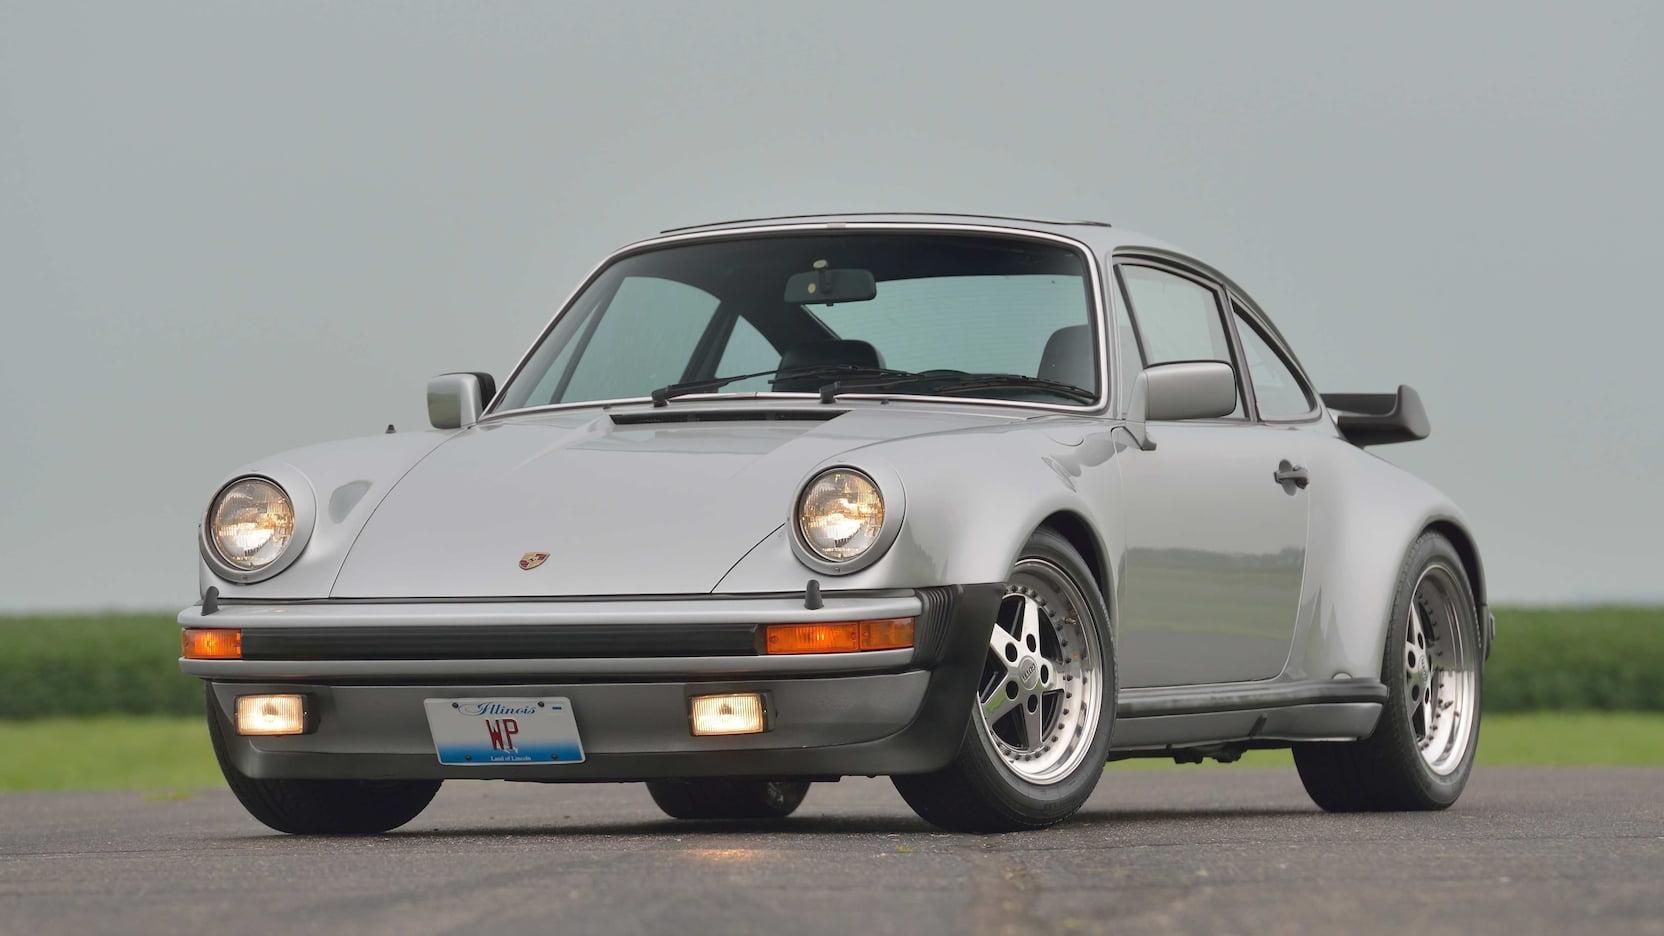 Da Porsche! One lucky Bears fan could score Walter Payton's 930 Turbo thumbnail